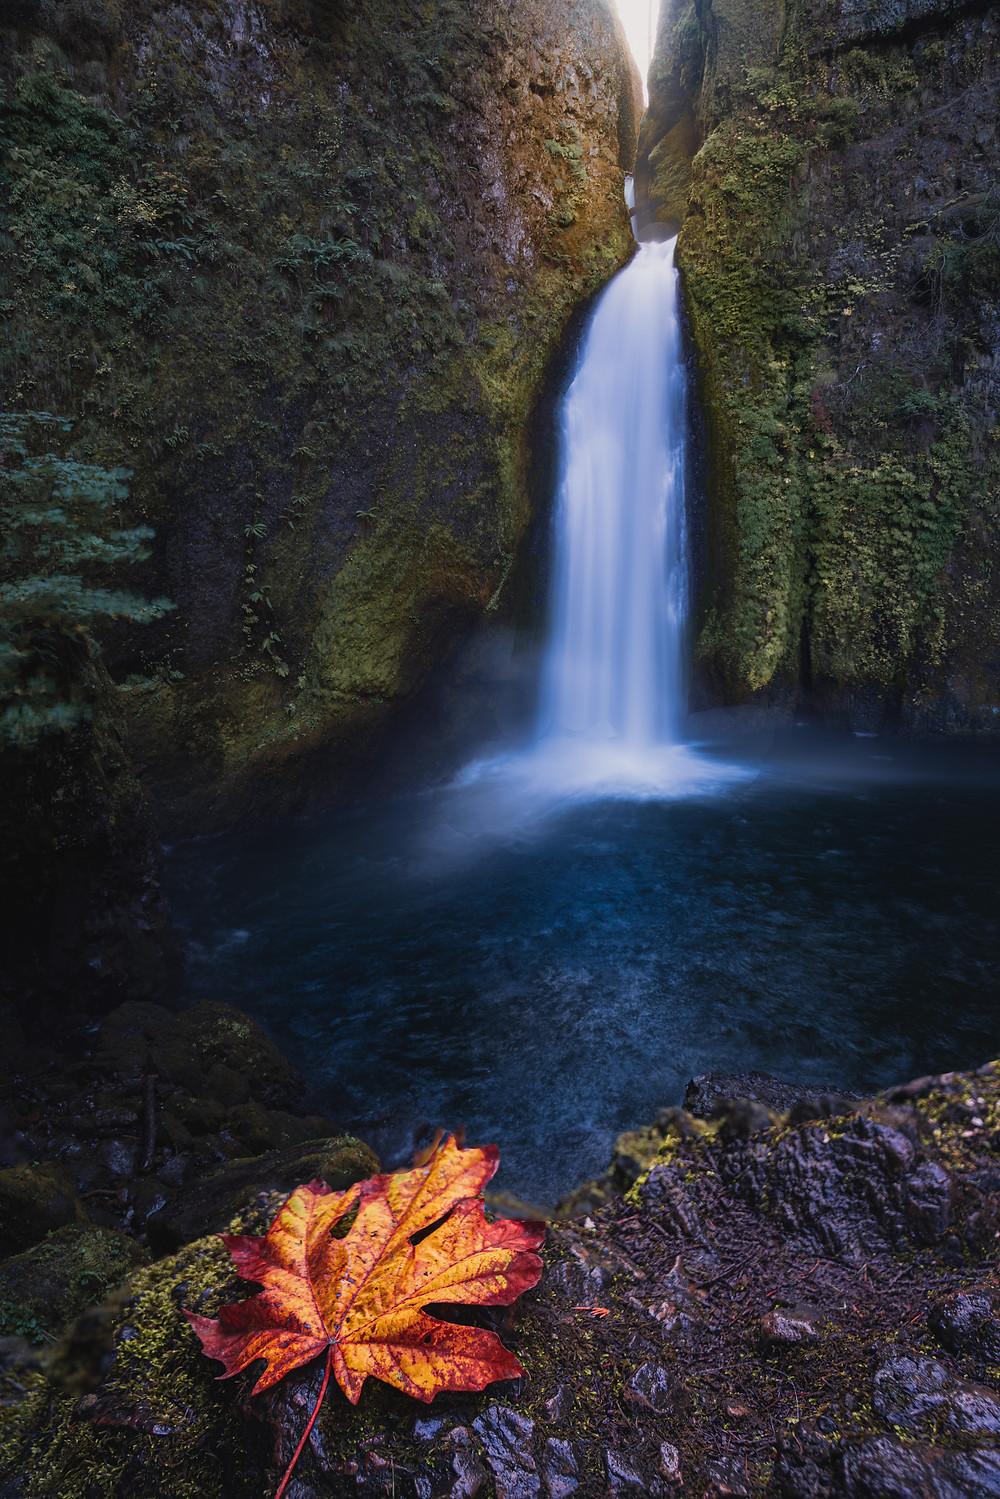 Fall foliage at Wahclella Falls in the Columbia River Gorge in Portland, Oregon